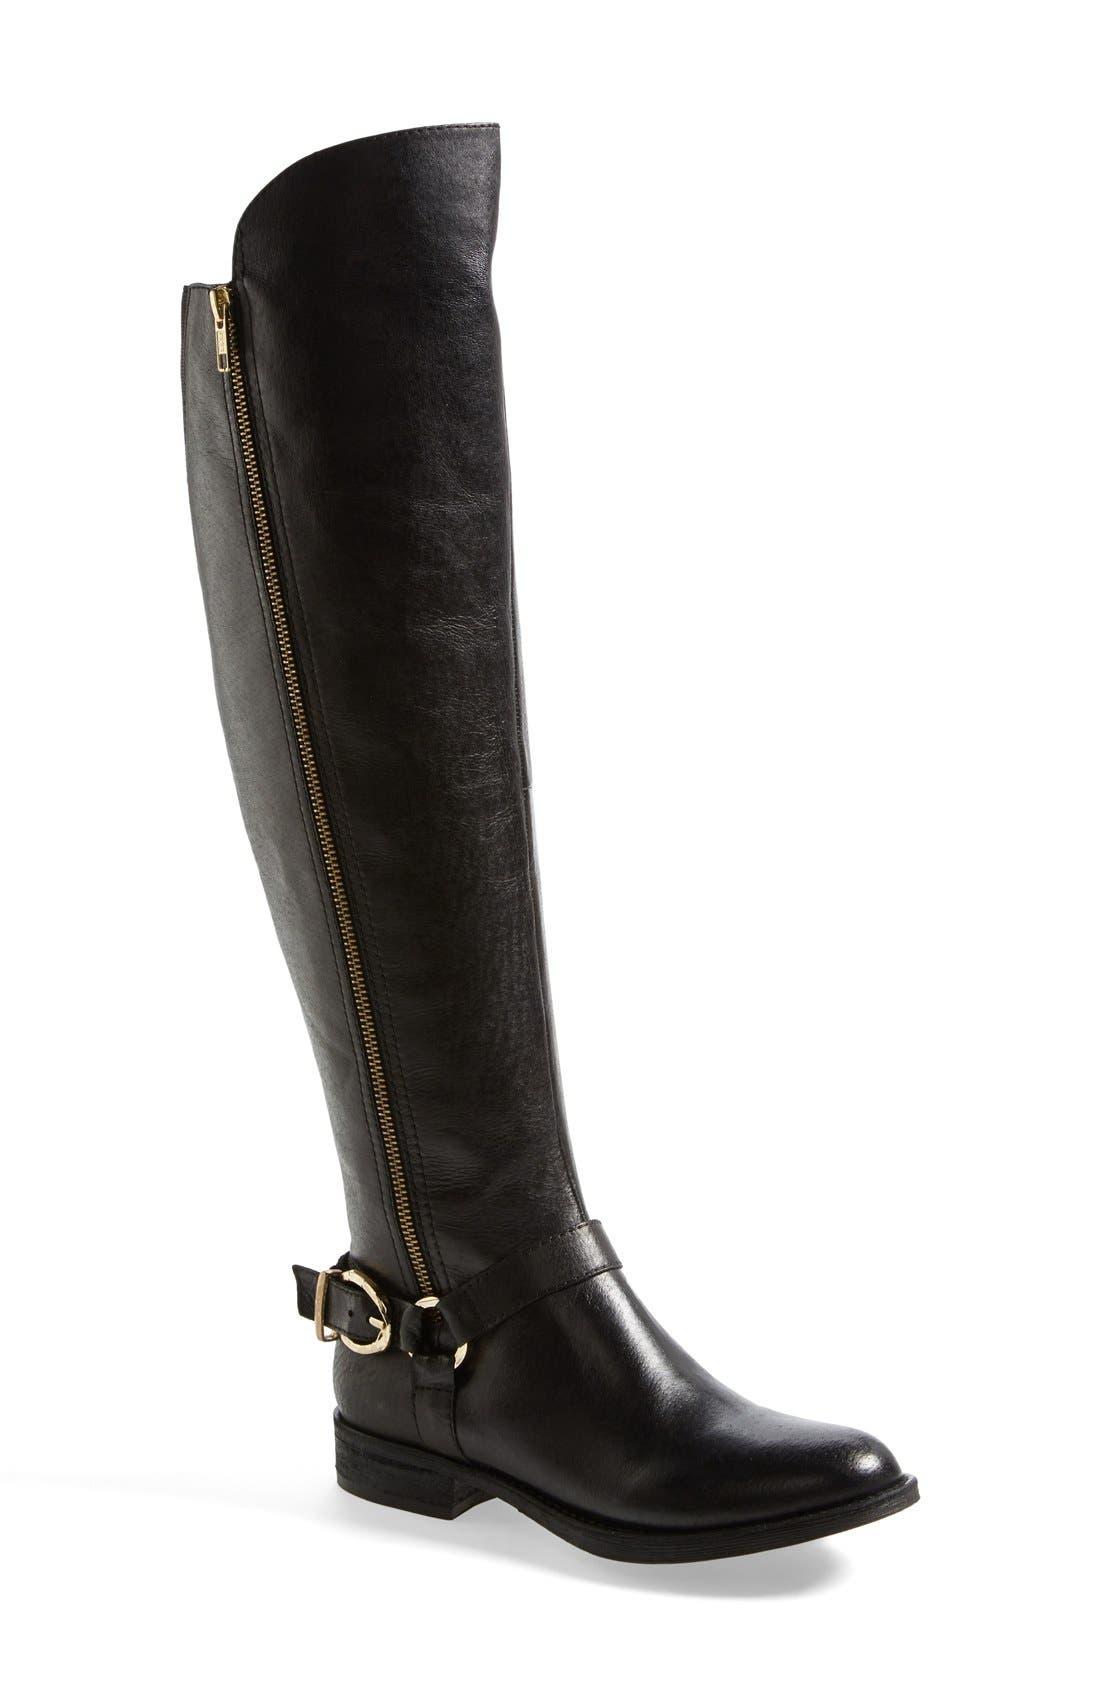 Steve Madden Womens Brown Boots Leather Skippur